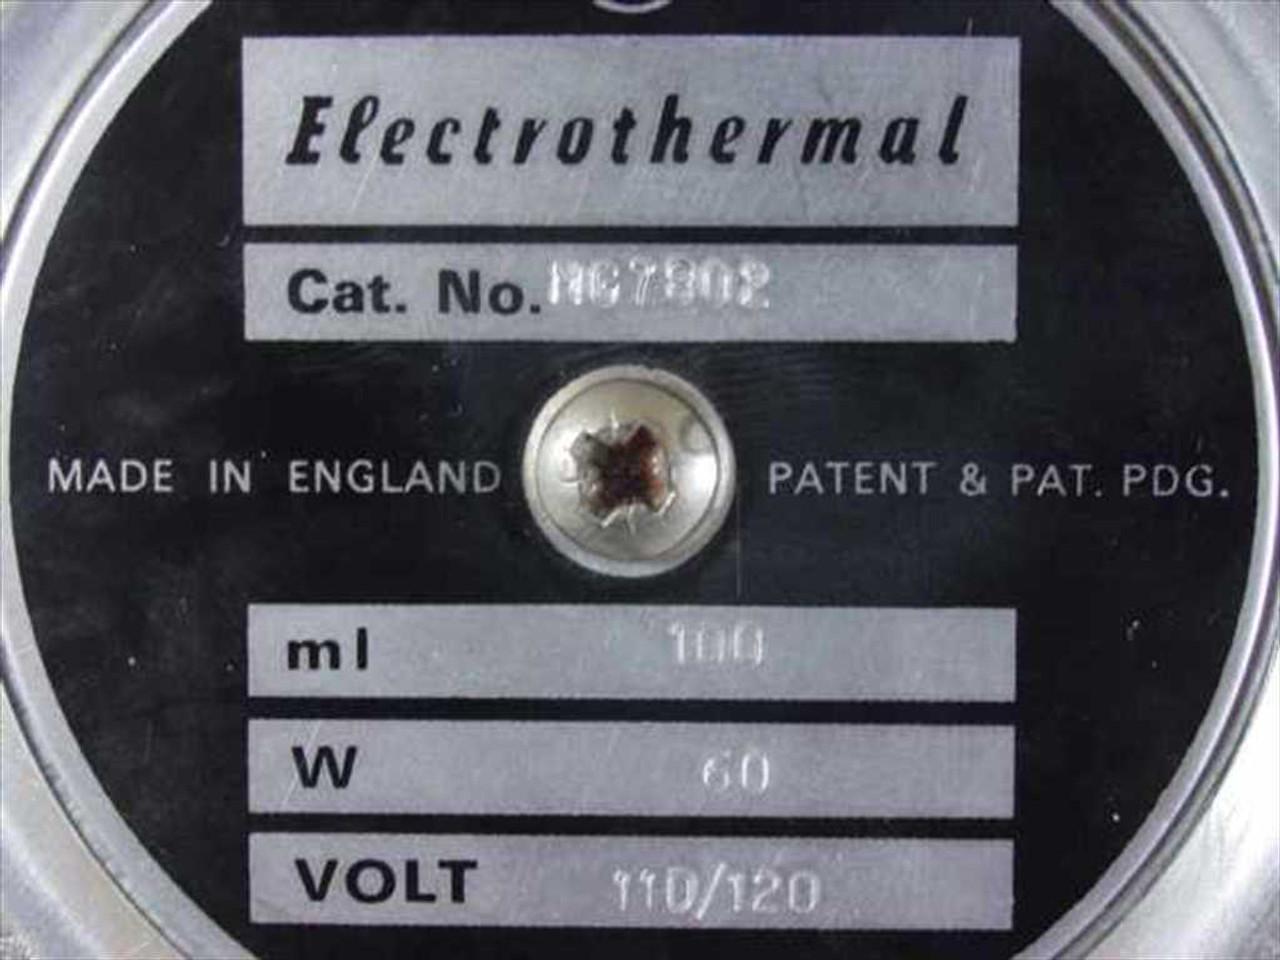 MG MG7802 100 ML Electrothermal Heating Mantle 110/120V 60W